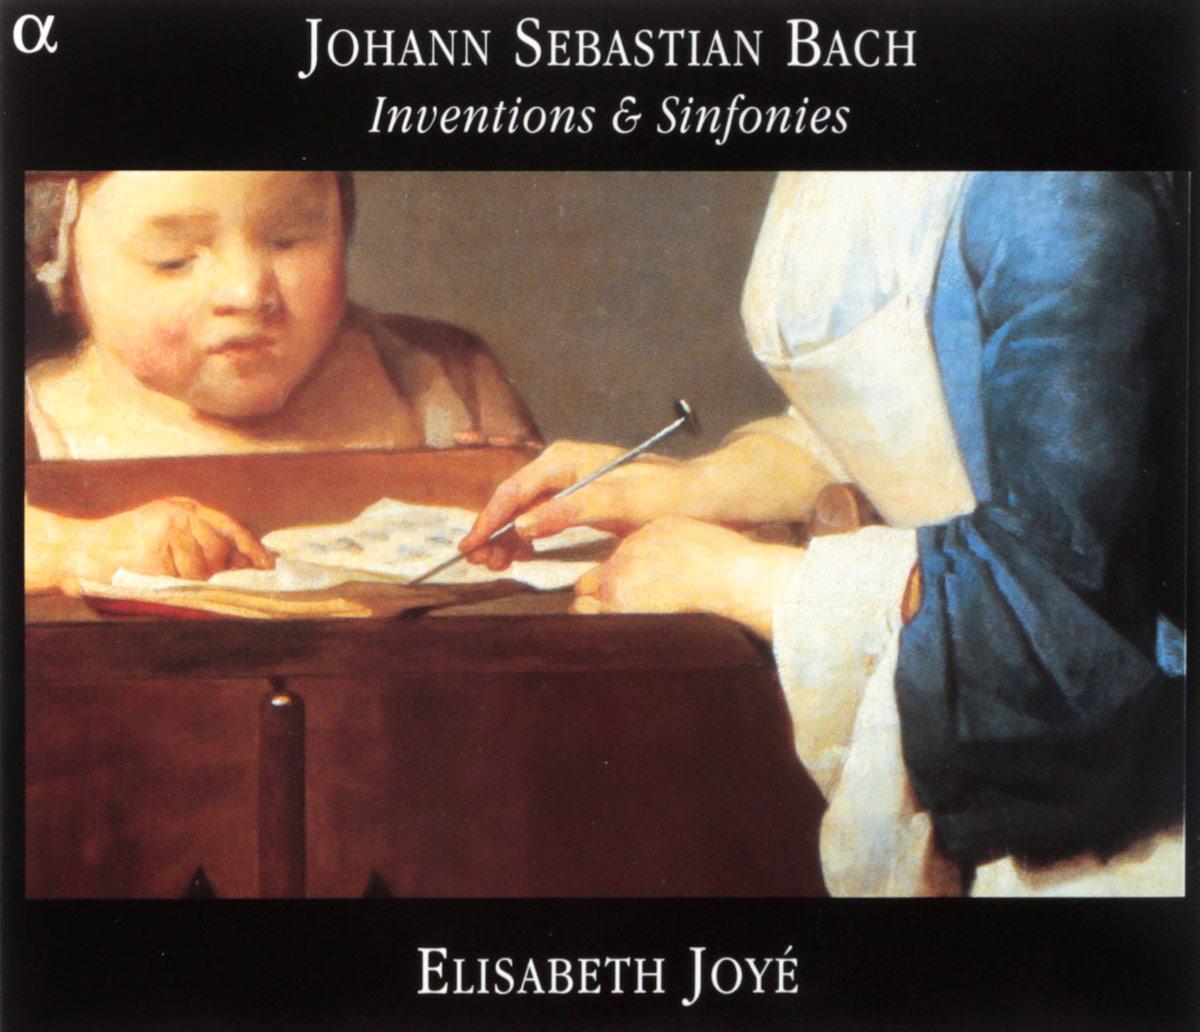 VARIOUS. BACH, J.S. / INVENTIONS (BWV772-786) & SINFONIES (BWV787-801)/ELISABETH JOYE, HARPSICHORD. 1